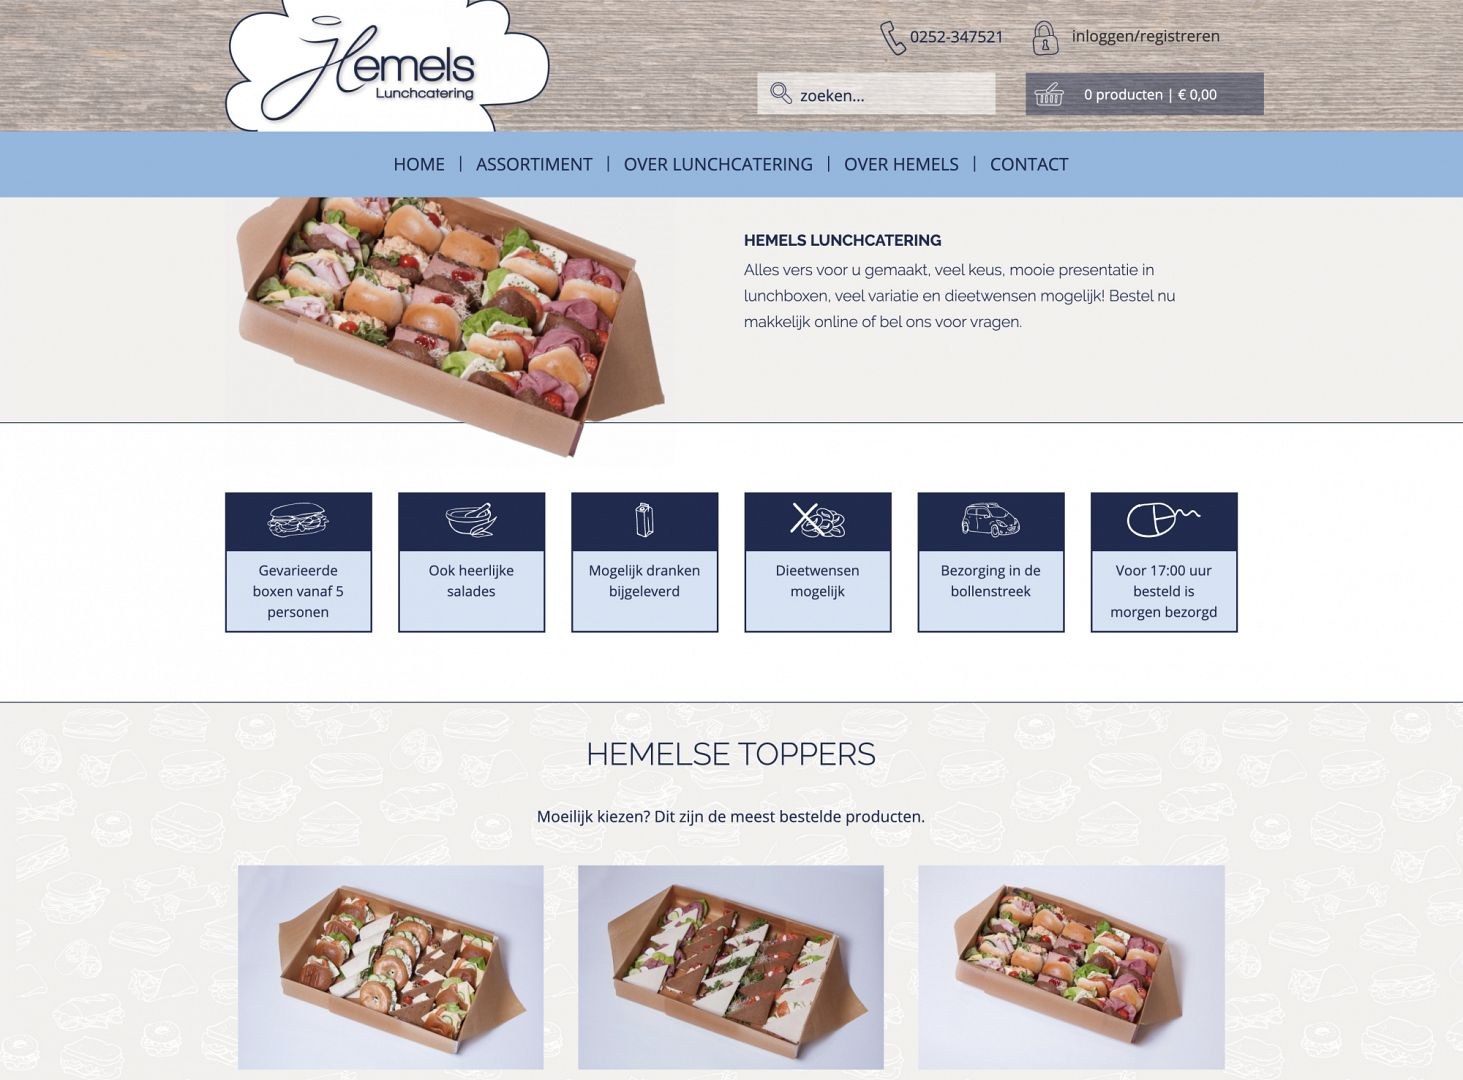 Hemels lunchcatering